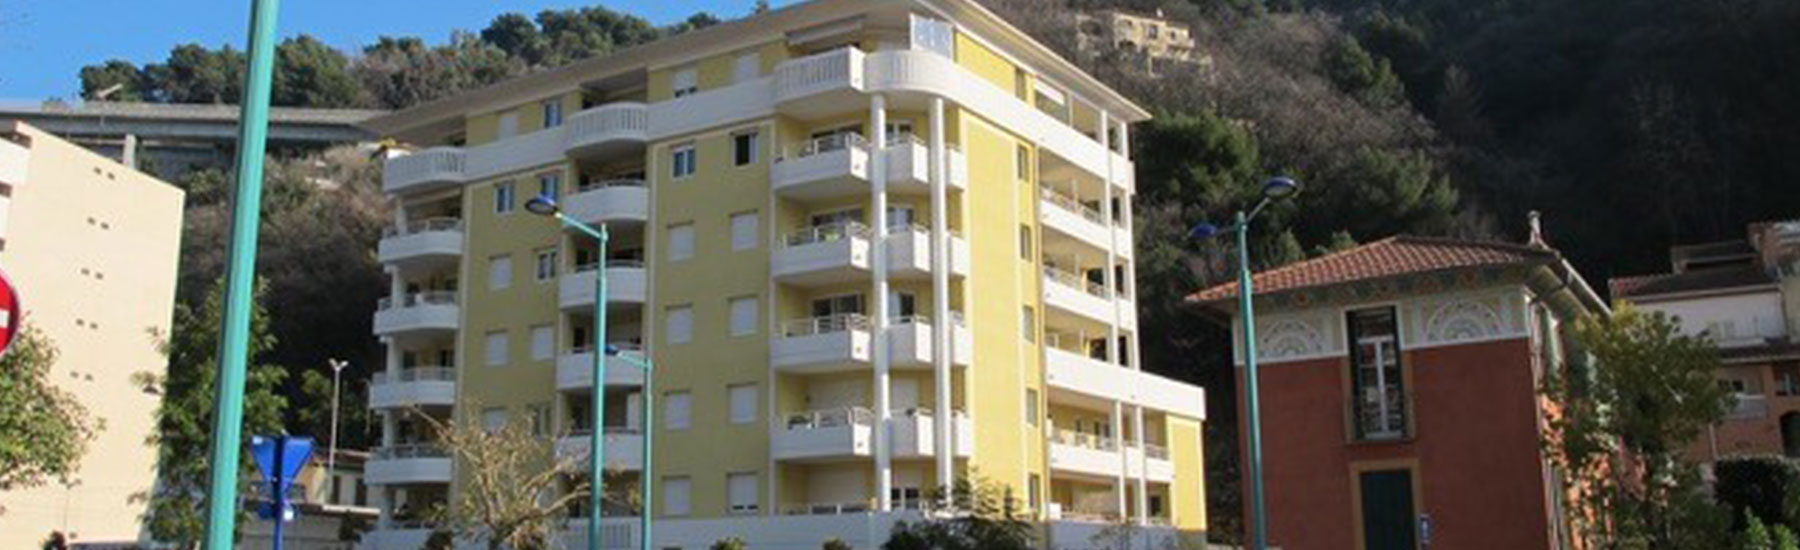 Expert judiciaire menton 06 cabinet architecture pr s de nice apponio architecte - Cabinet expertise batiment ...